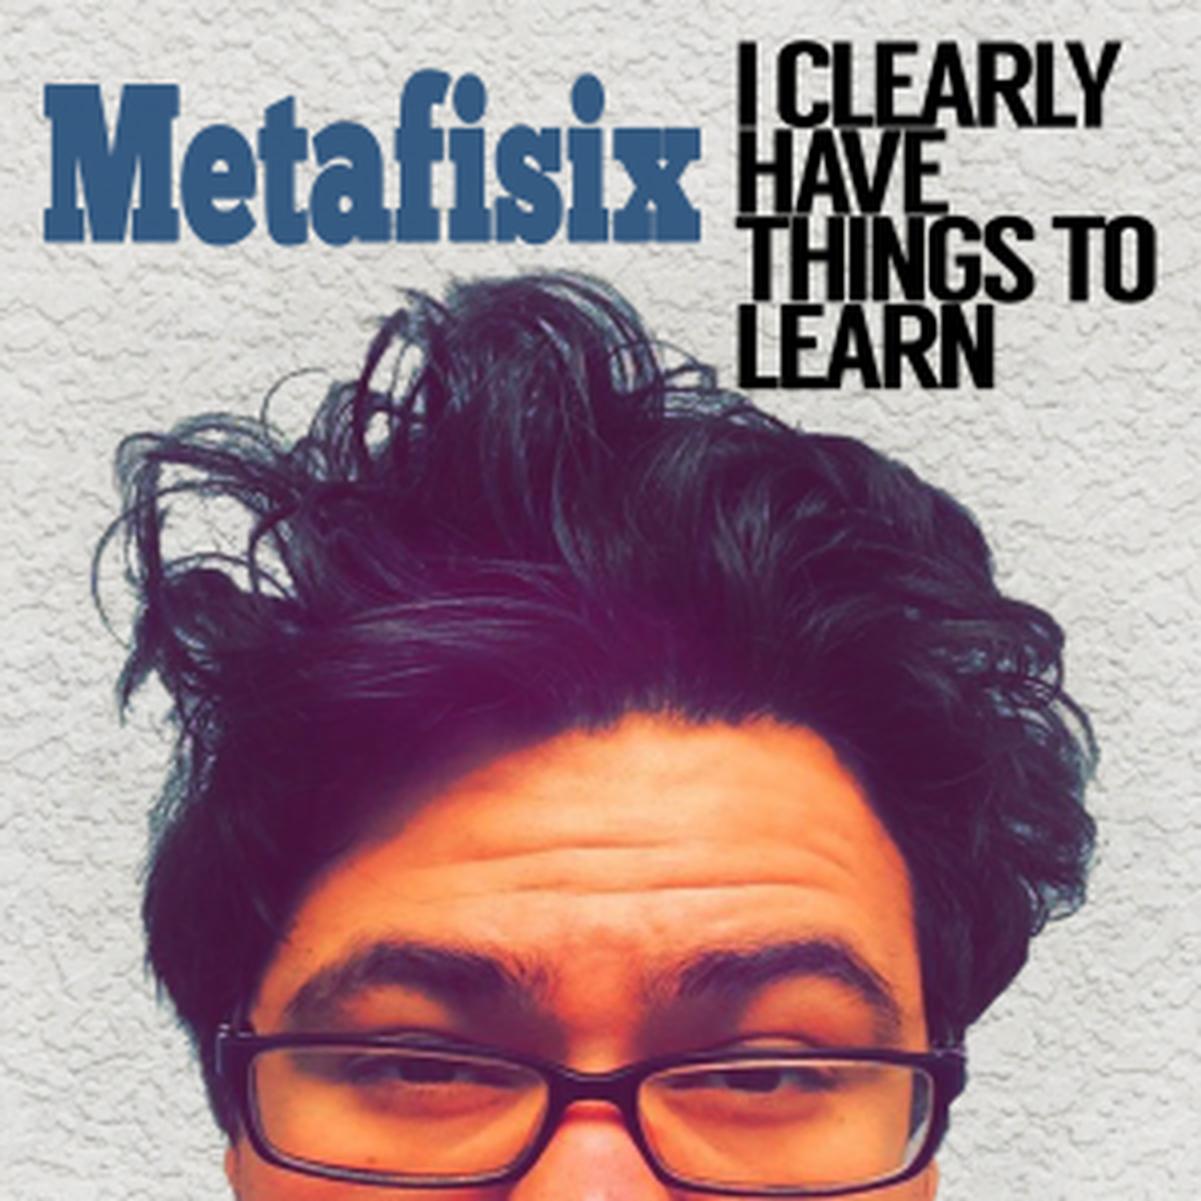 Metafisix